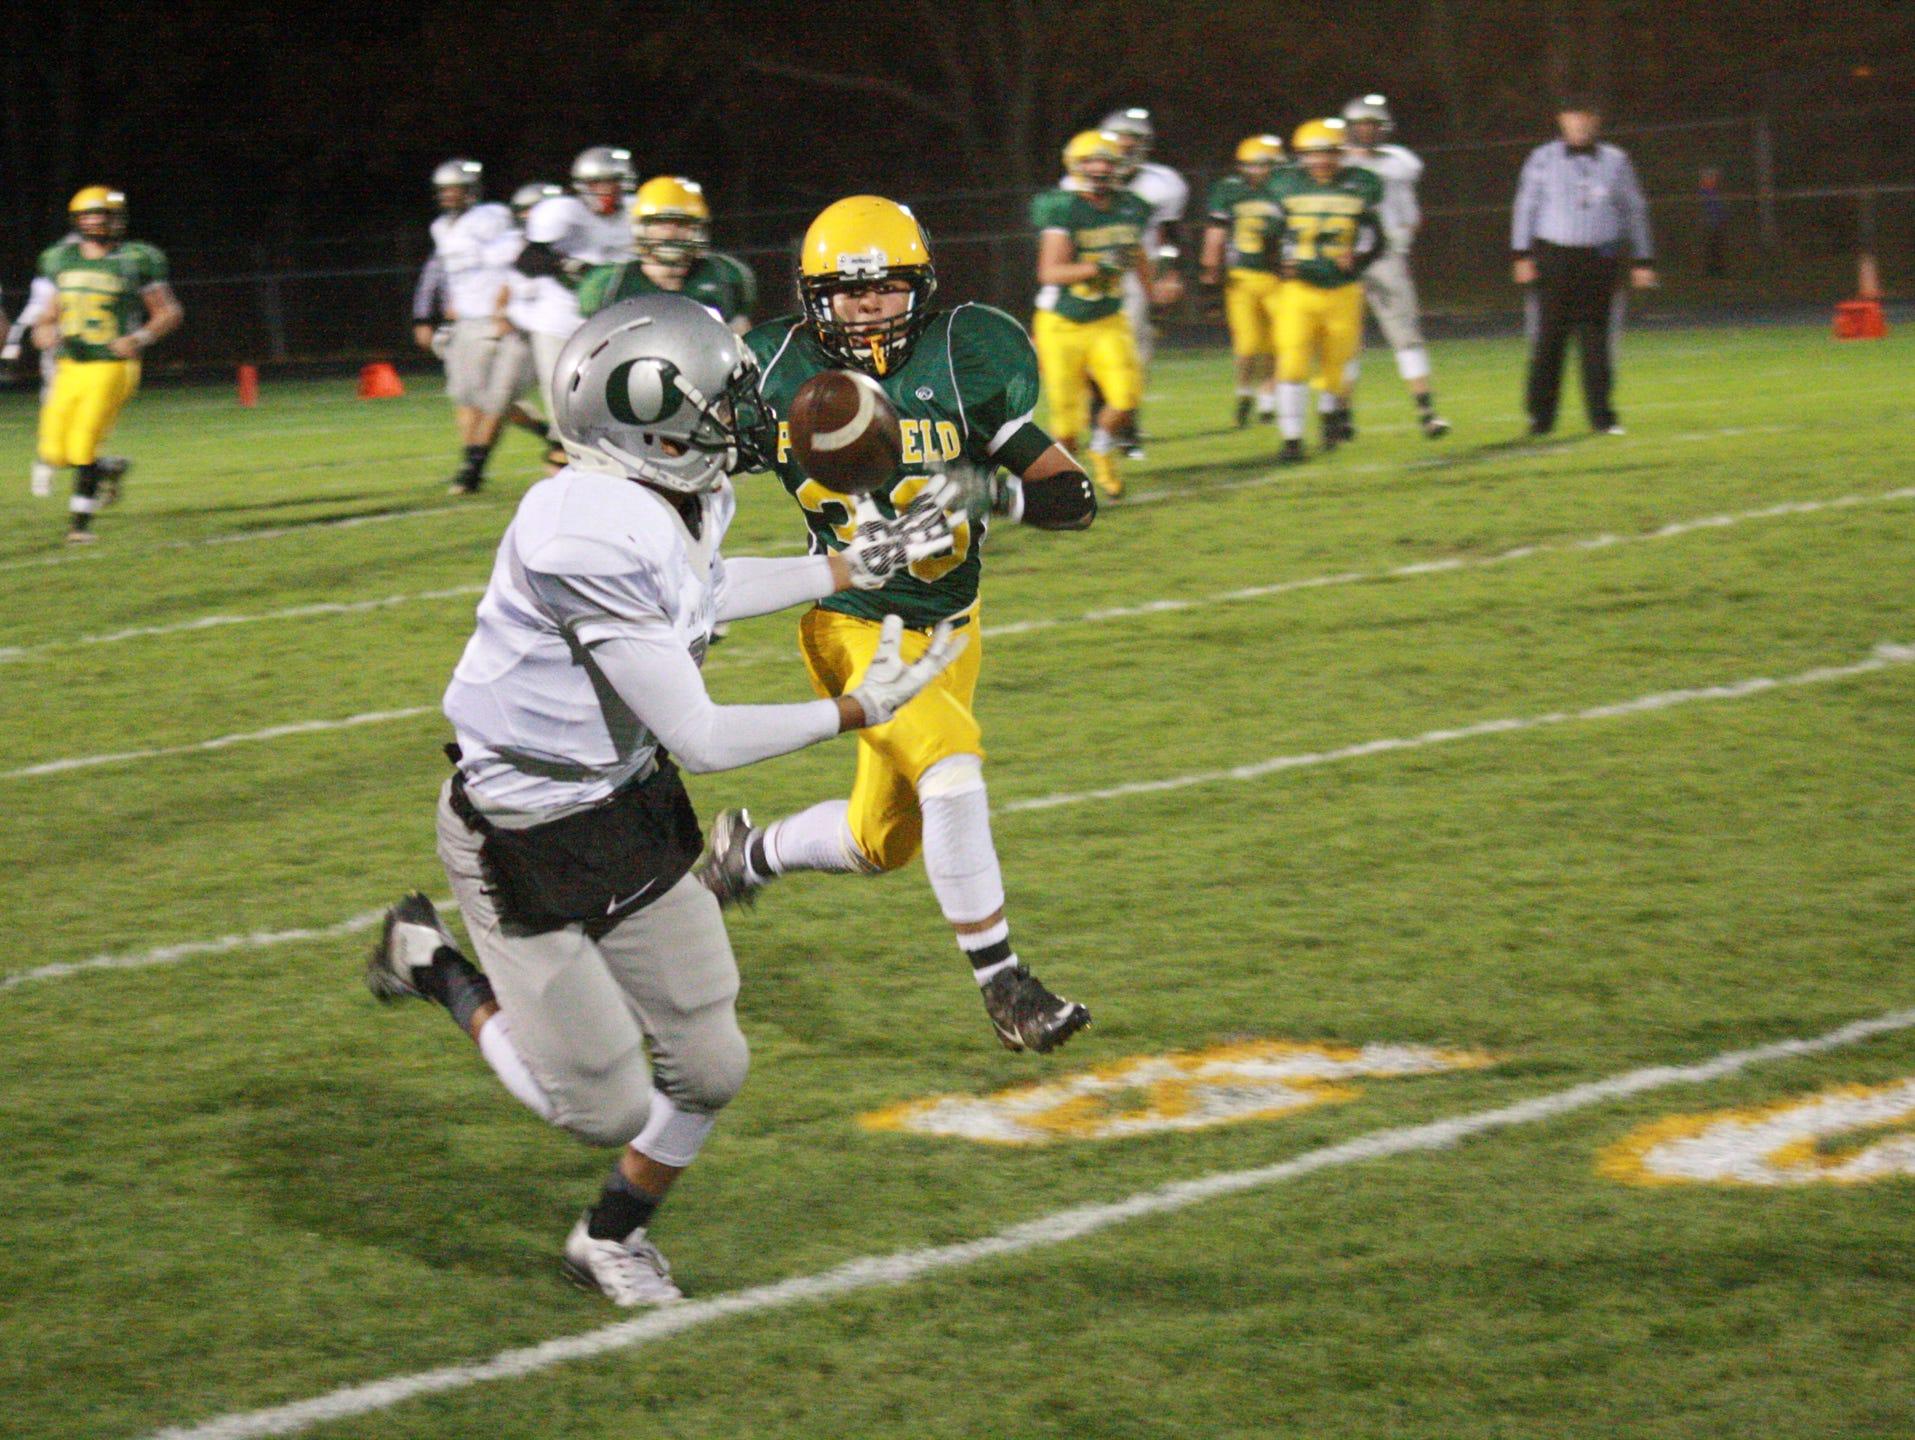 Olivet High Schol Junior Freddy Fuentes misses a catch against Pennfield High School Friday night